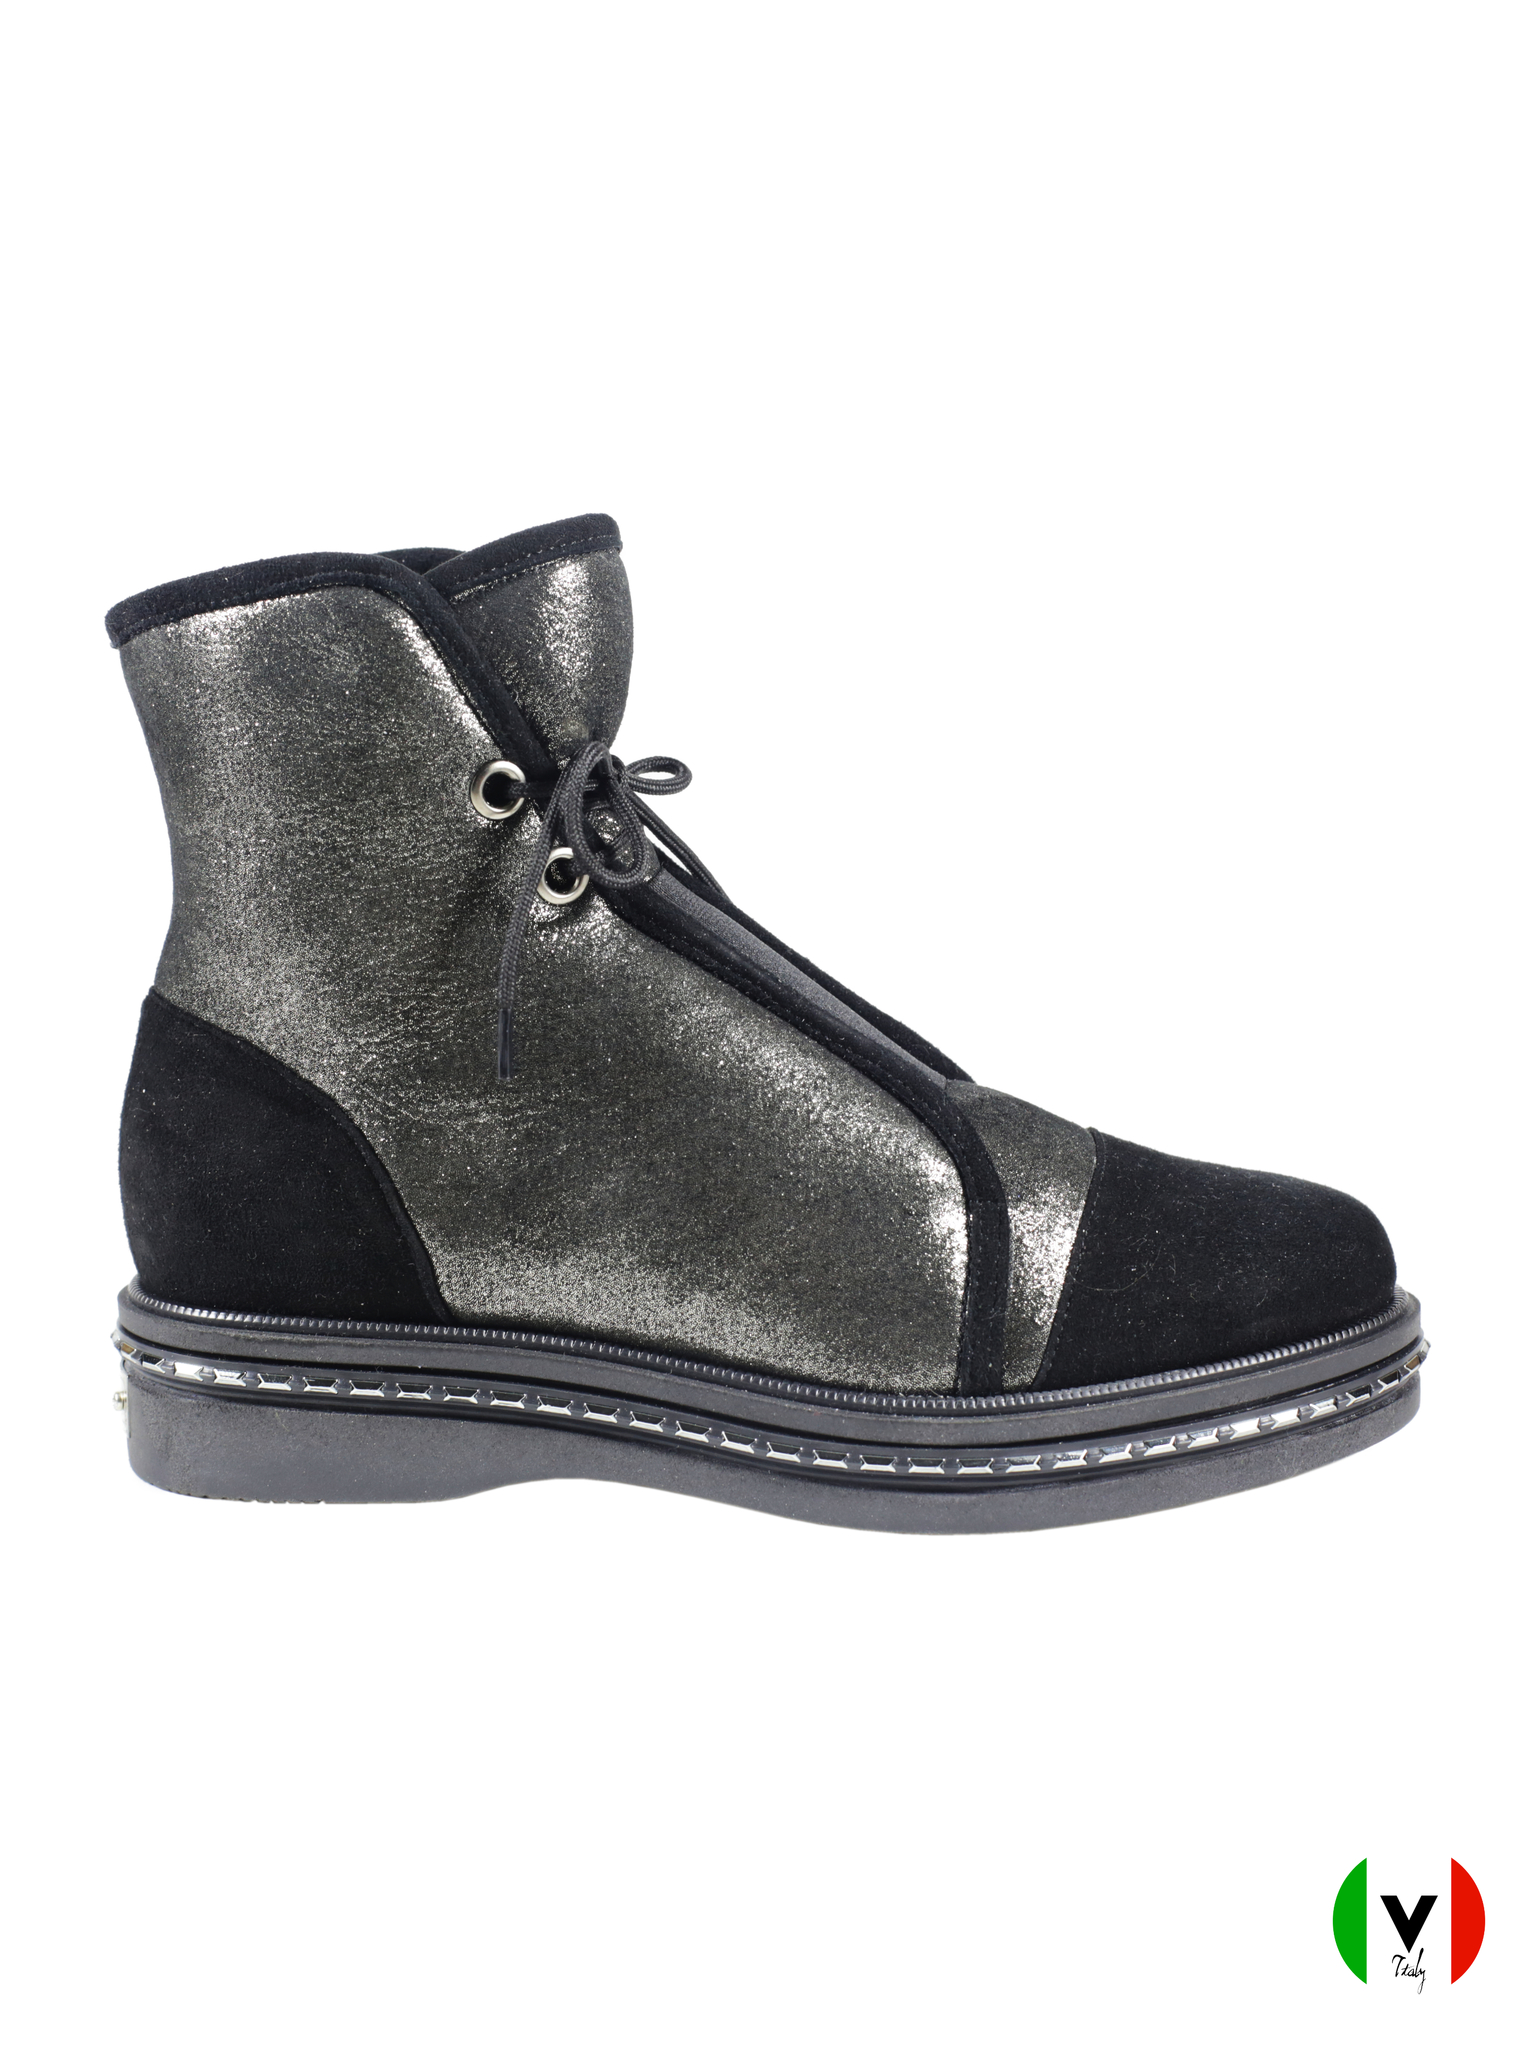 Зимние ботинки Mara чёрно-зотистого цвета 651, артикул 651, сезон зима, цвет чёрно-золотистый, материал замша, цена 18 500 руб., veroitaly.ru